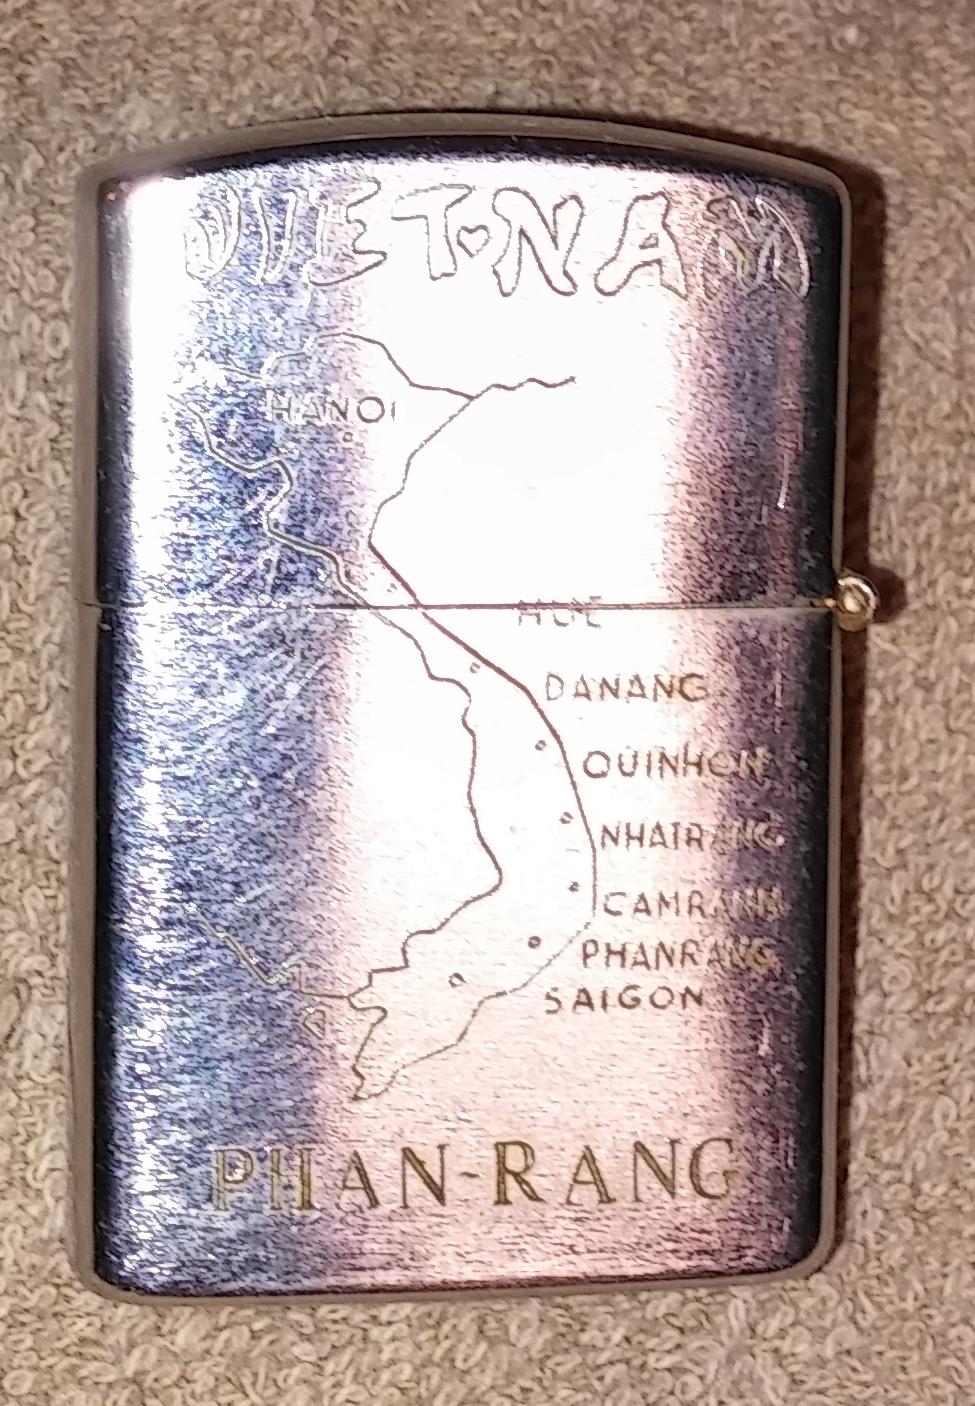 A couple of Vietnam era lighters 19700159